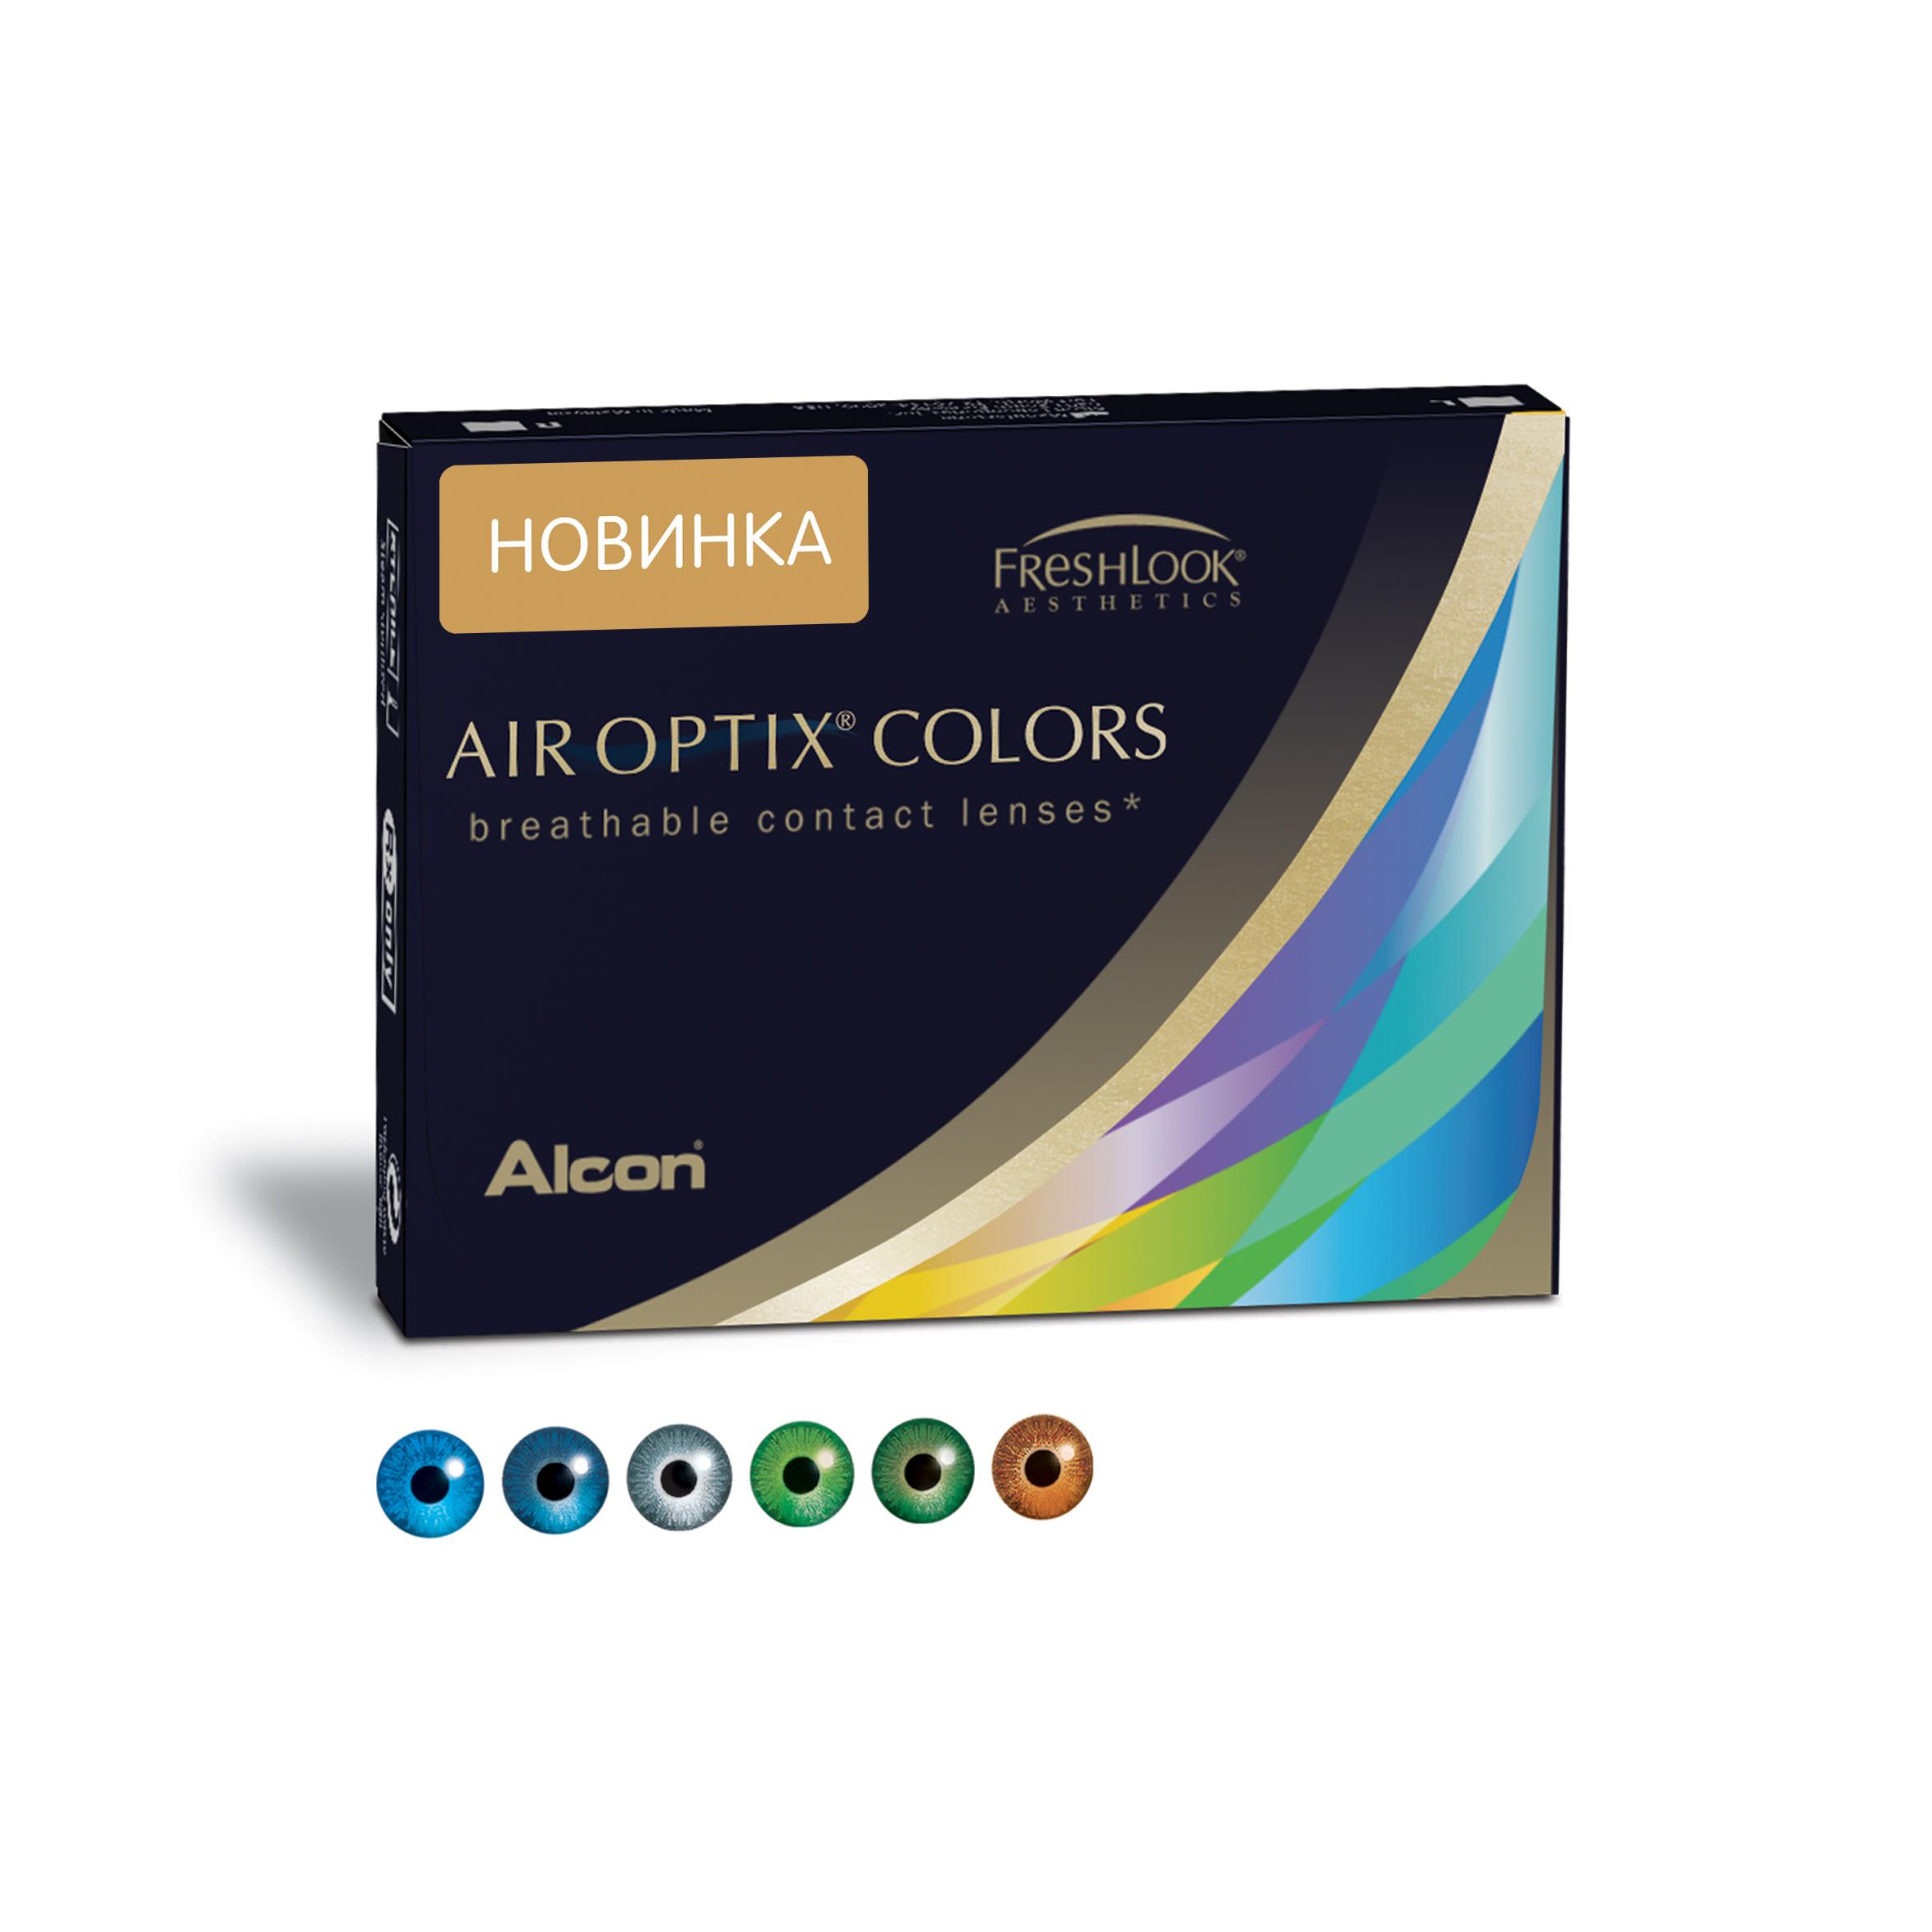 Аlcon контактные линзы Air Optix Colors 2 шт -4.00 Brilliant Blue ( 31746230 )